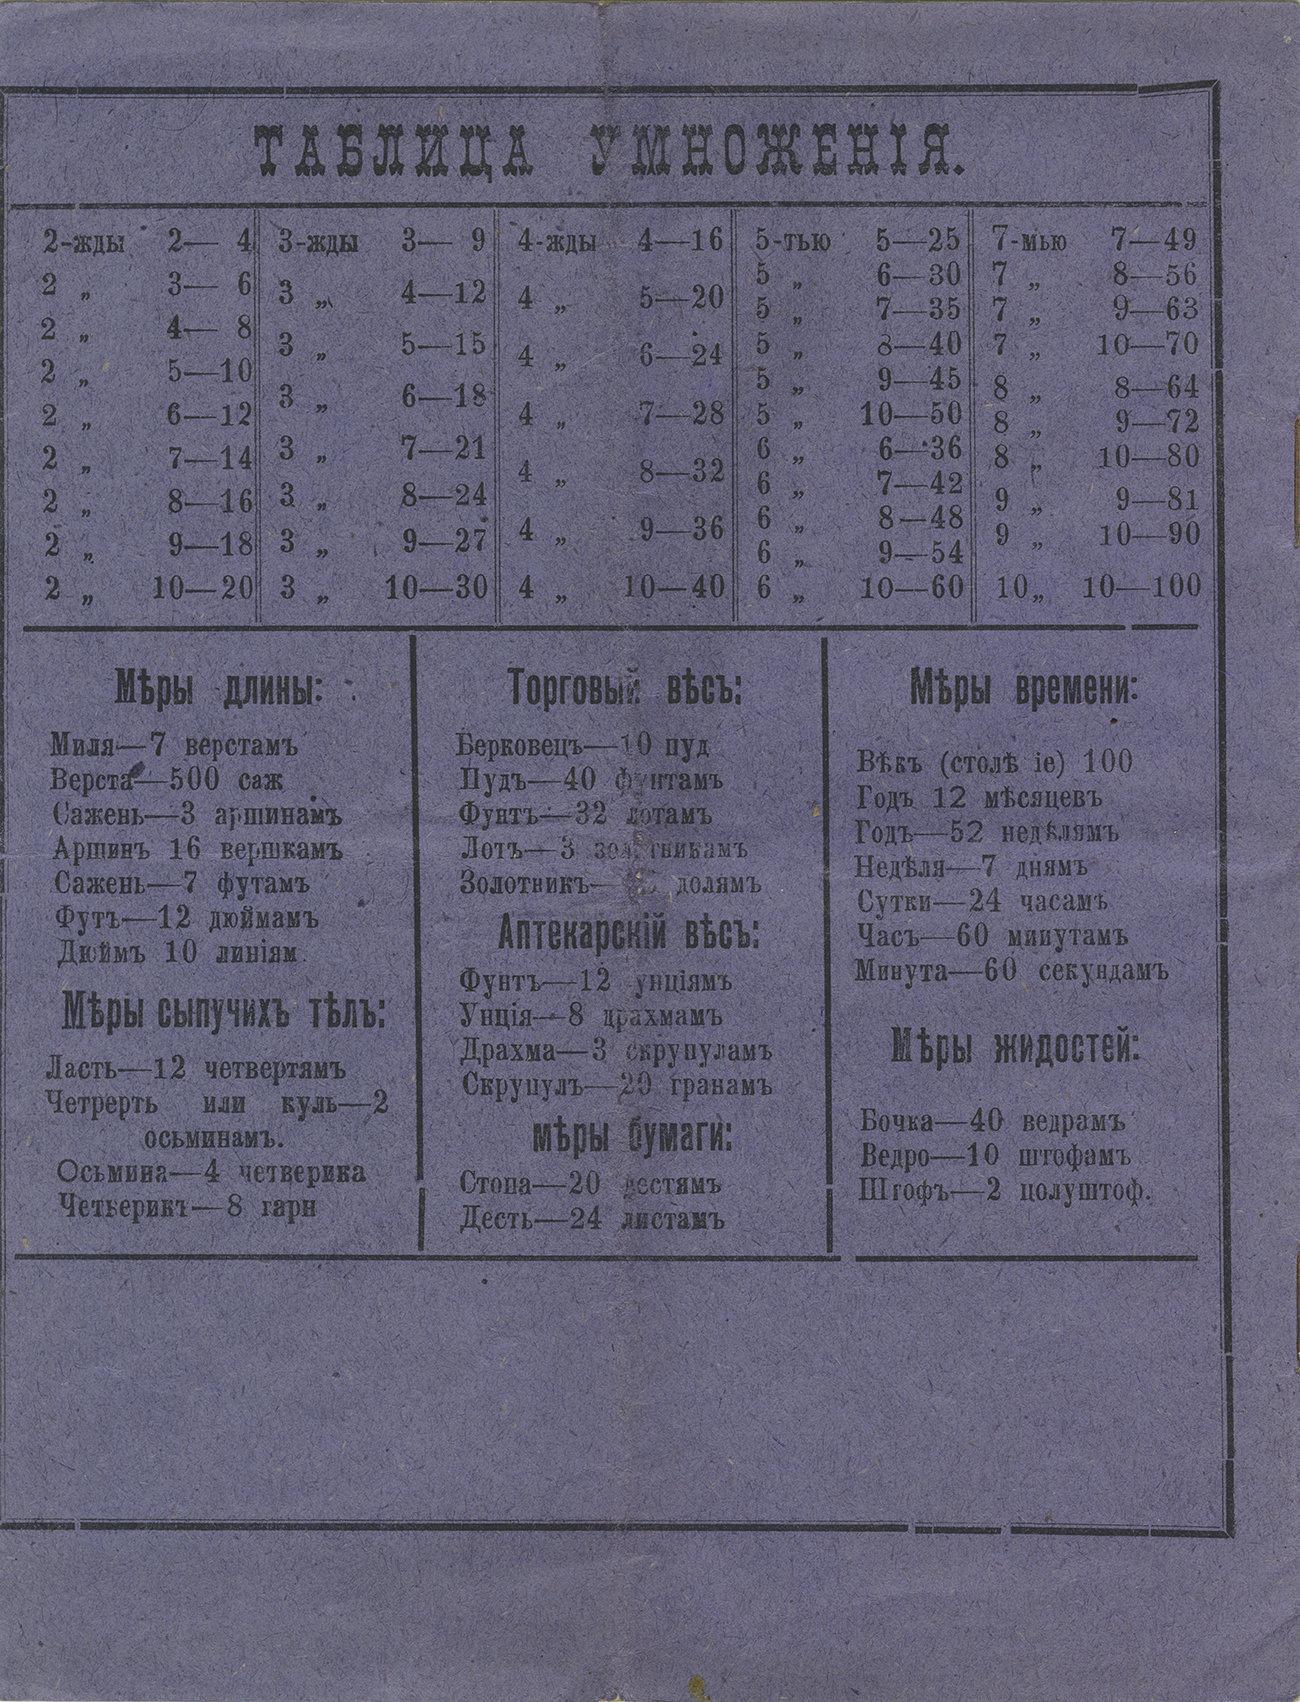 Тетрадь Евпатория, 1917, оборот